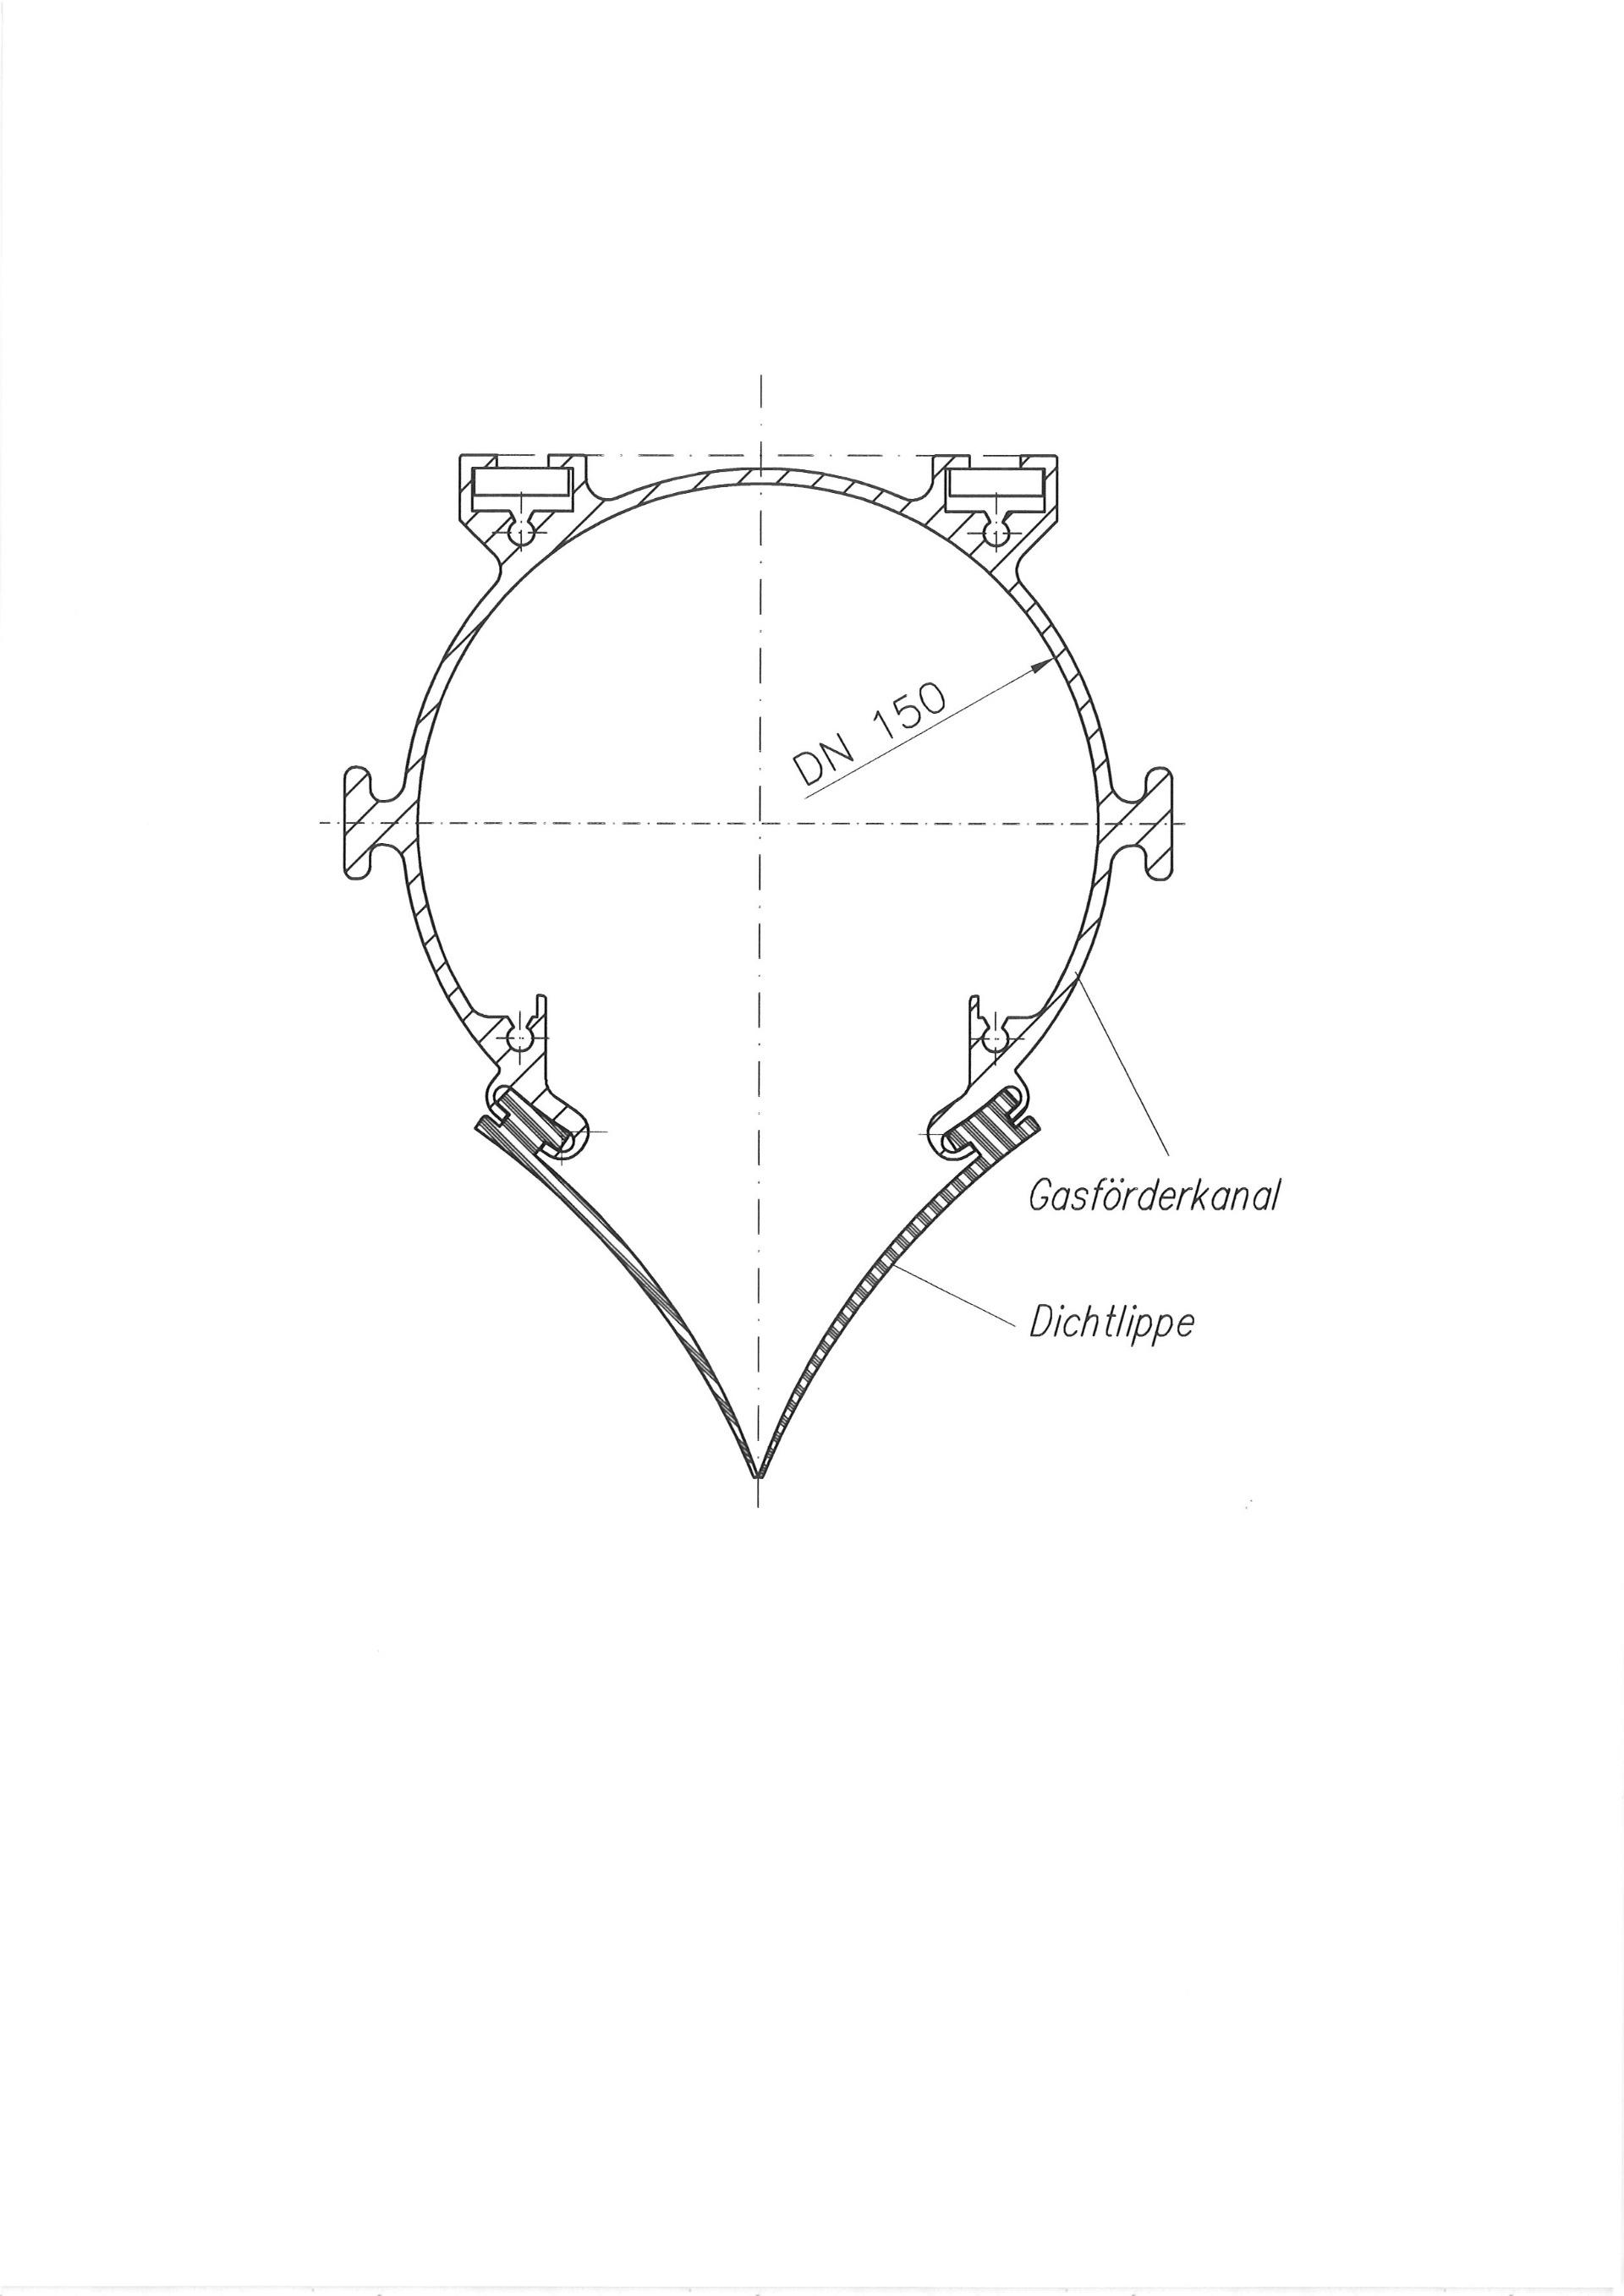 Gasförderkanal | Ludscheidt GmbH